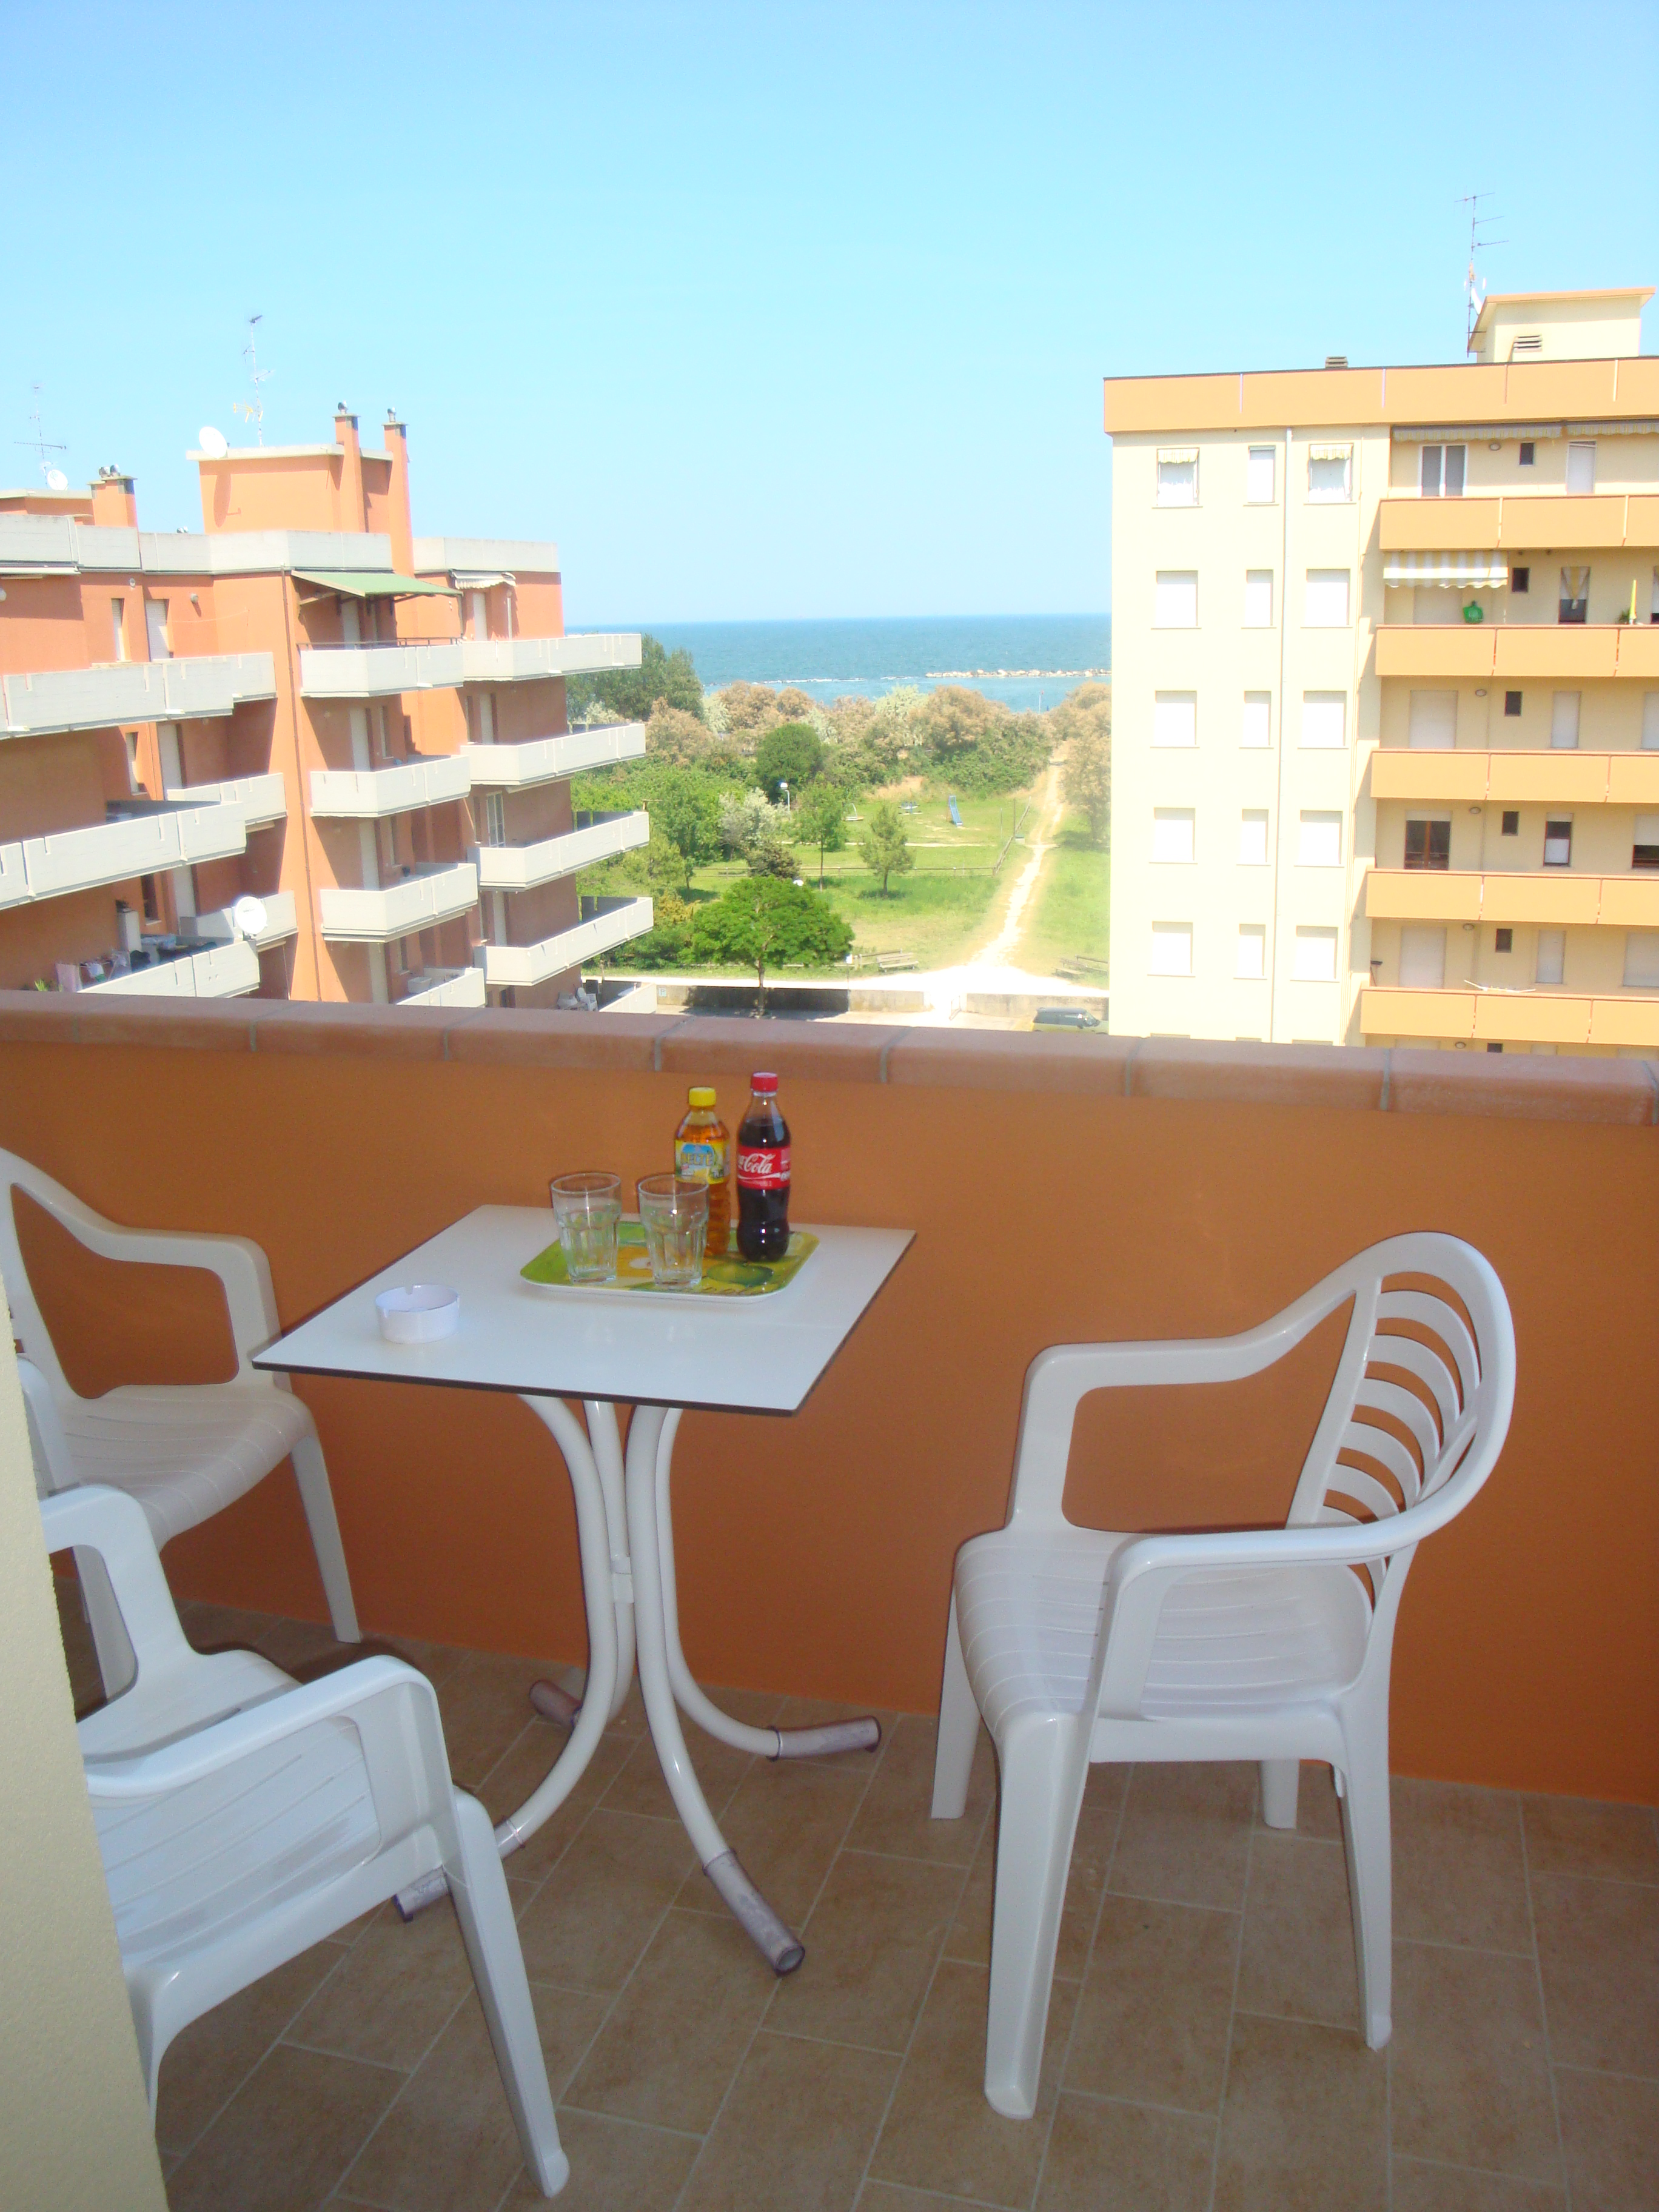 Pro Loco Lido Adriano - Immobiliari Hotel B&B Residence ...